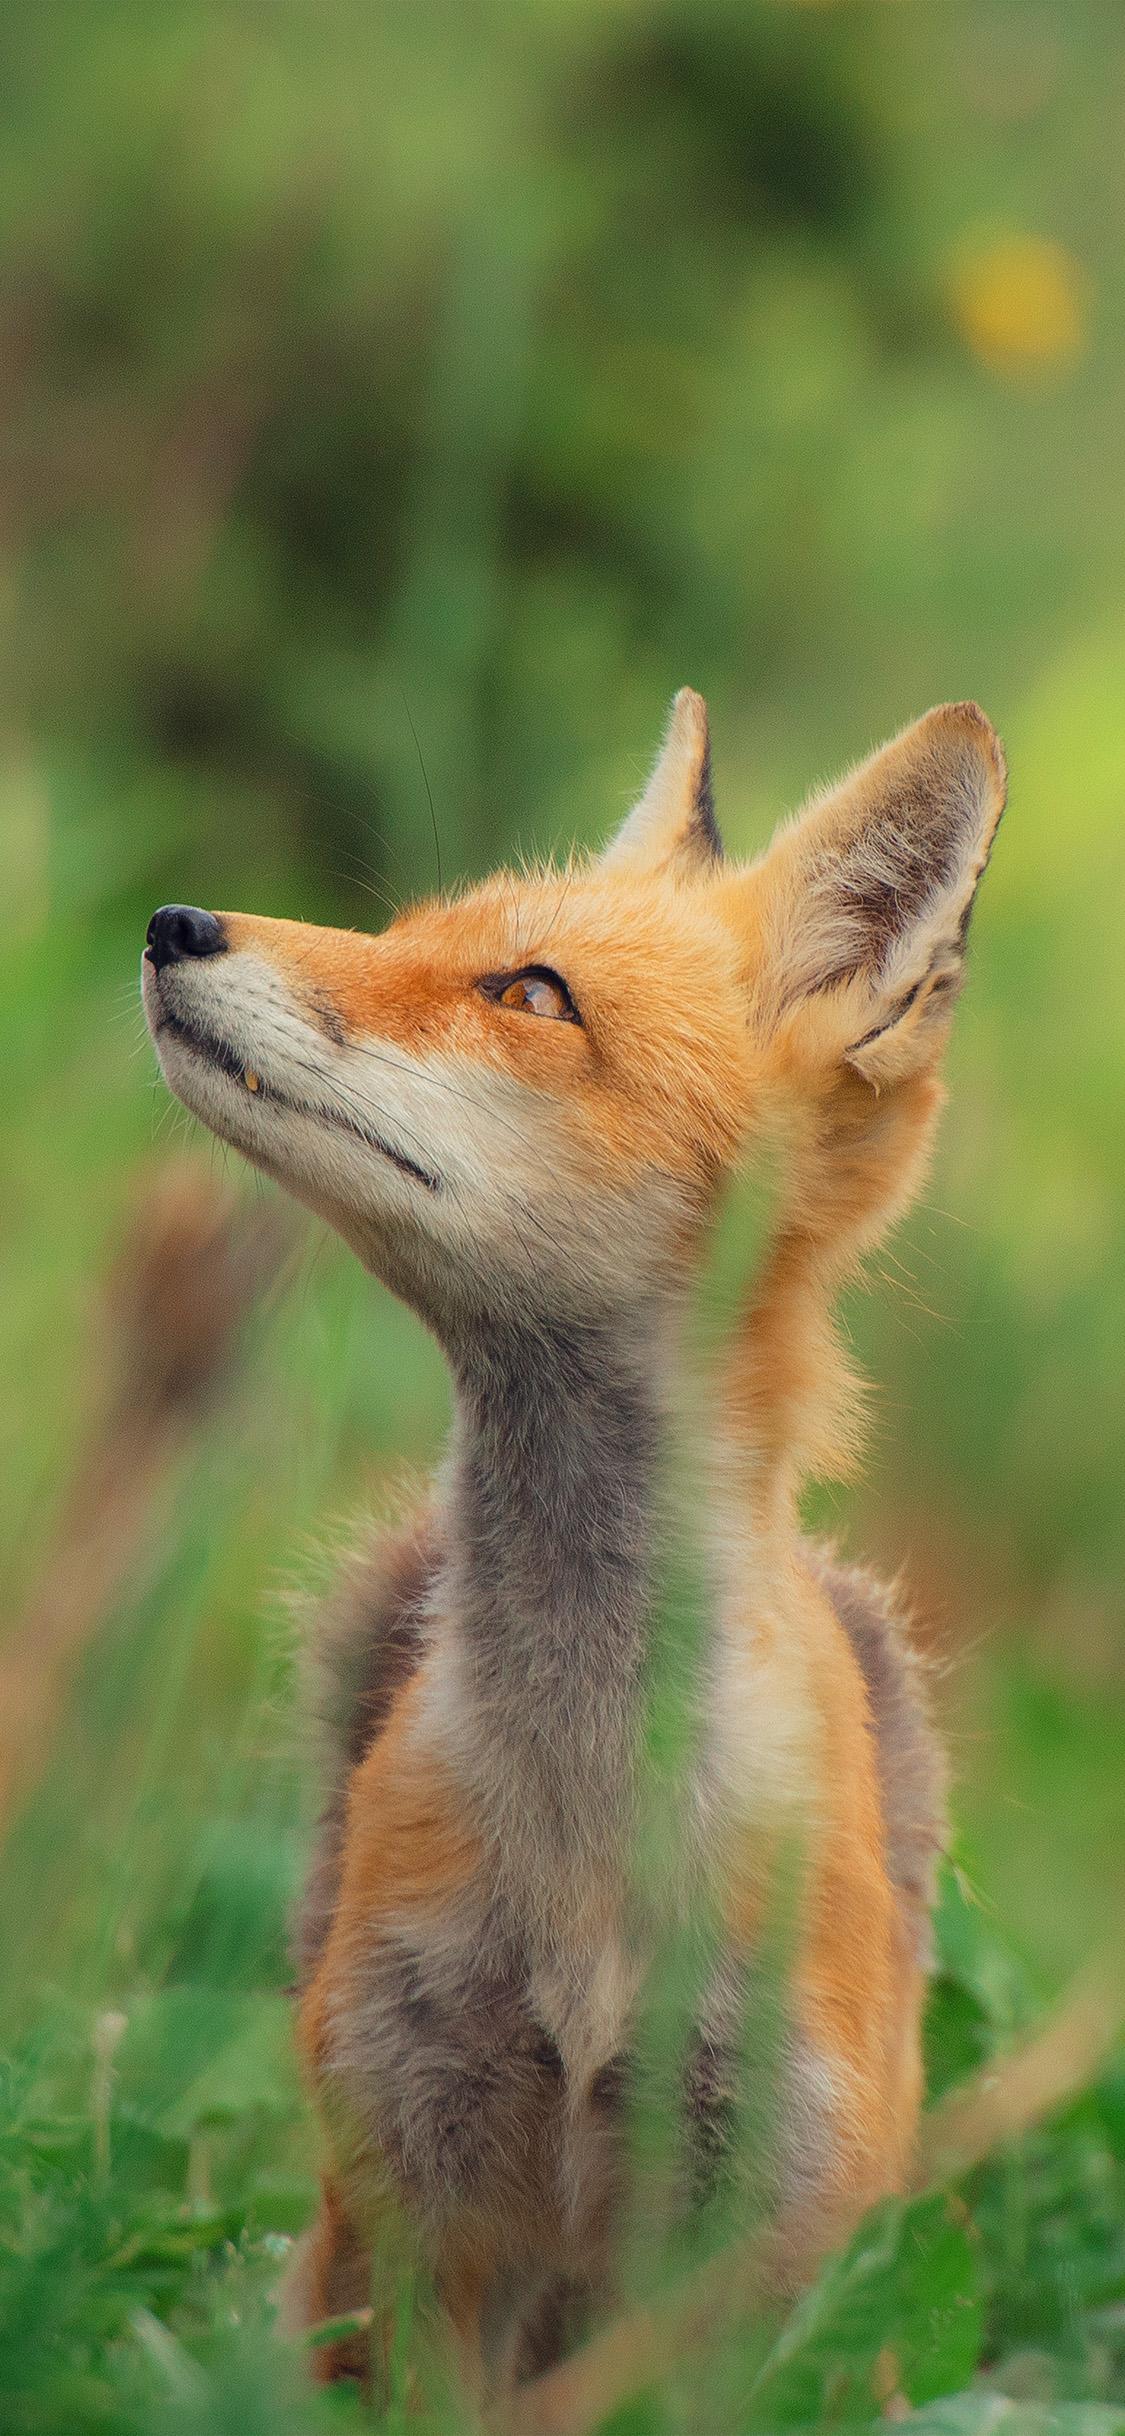 iPhonexpapers.com-Apple-iPhone-wallpaper-nz39-little-fox-animal-cute-nature